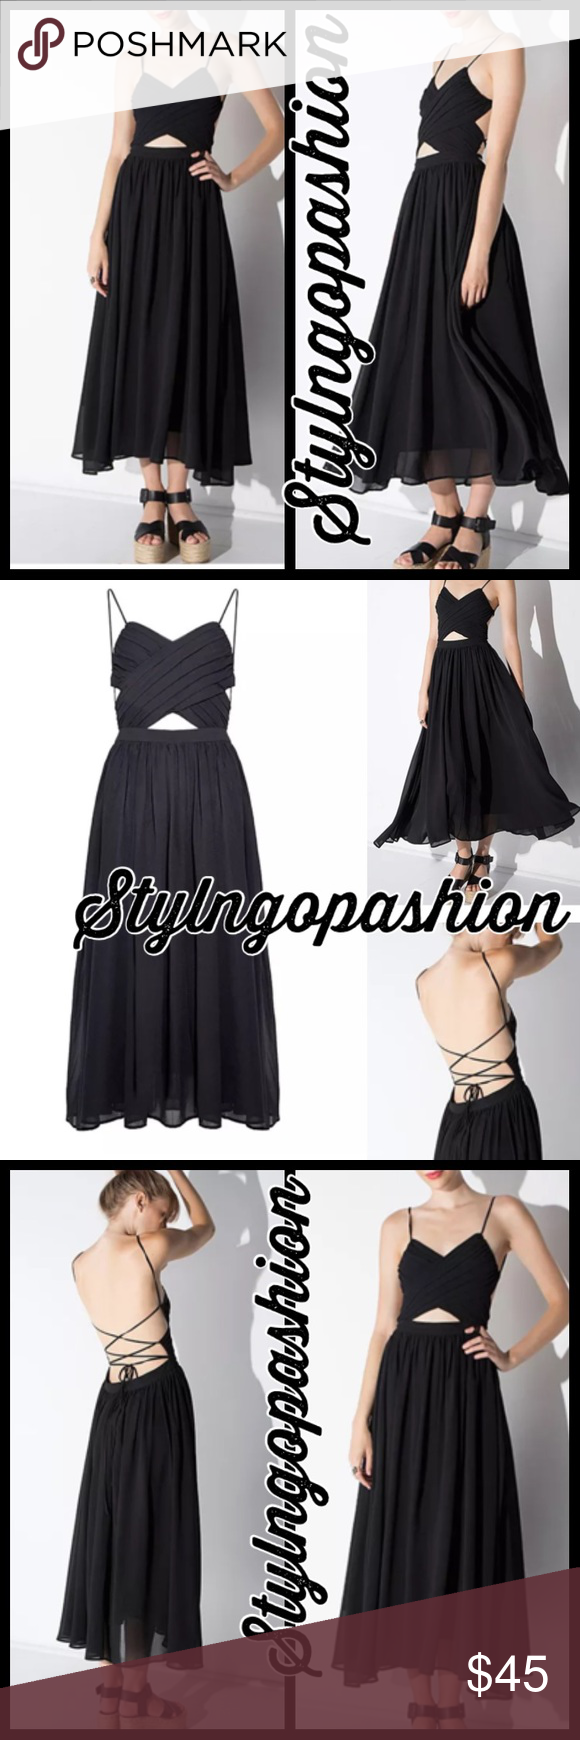 Black cut out maxi dress boutique maxi dresses and layering